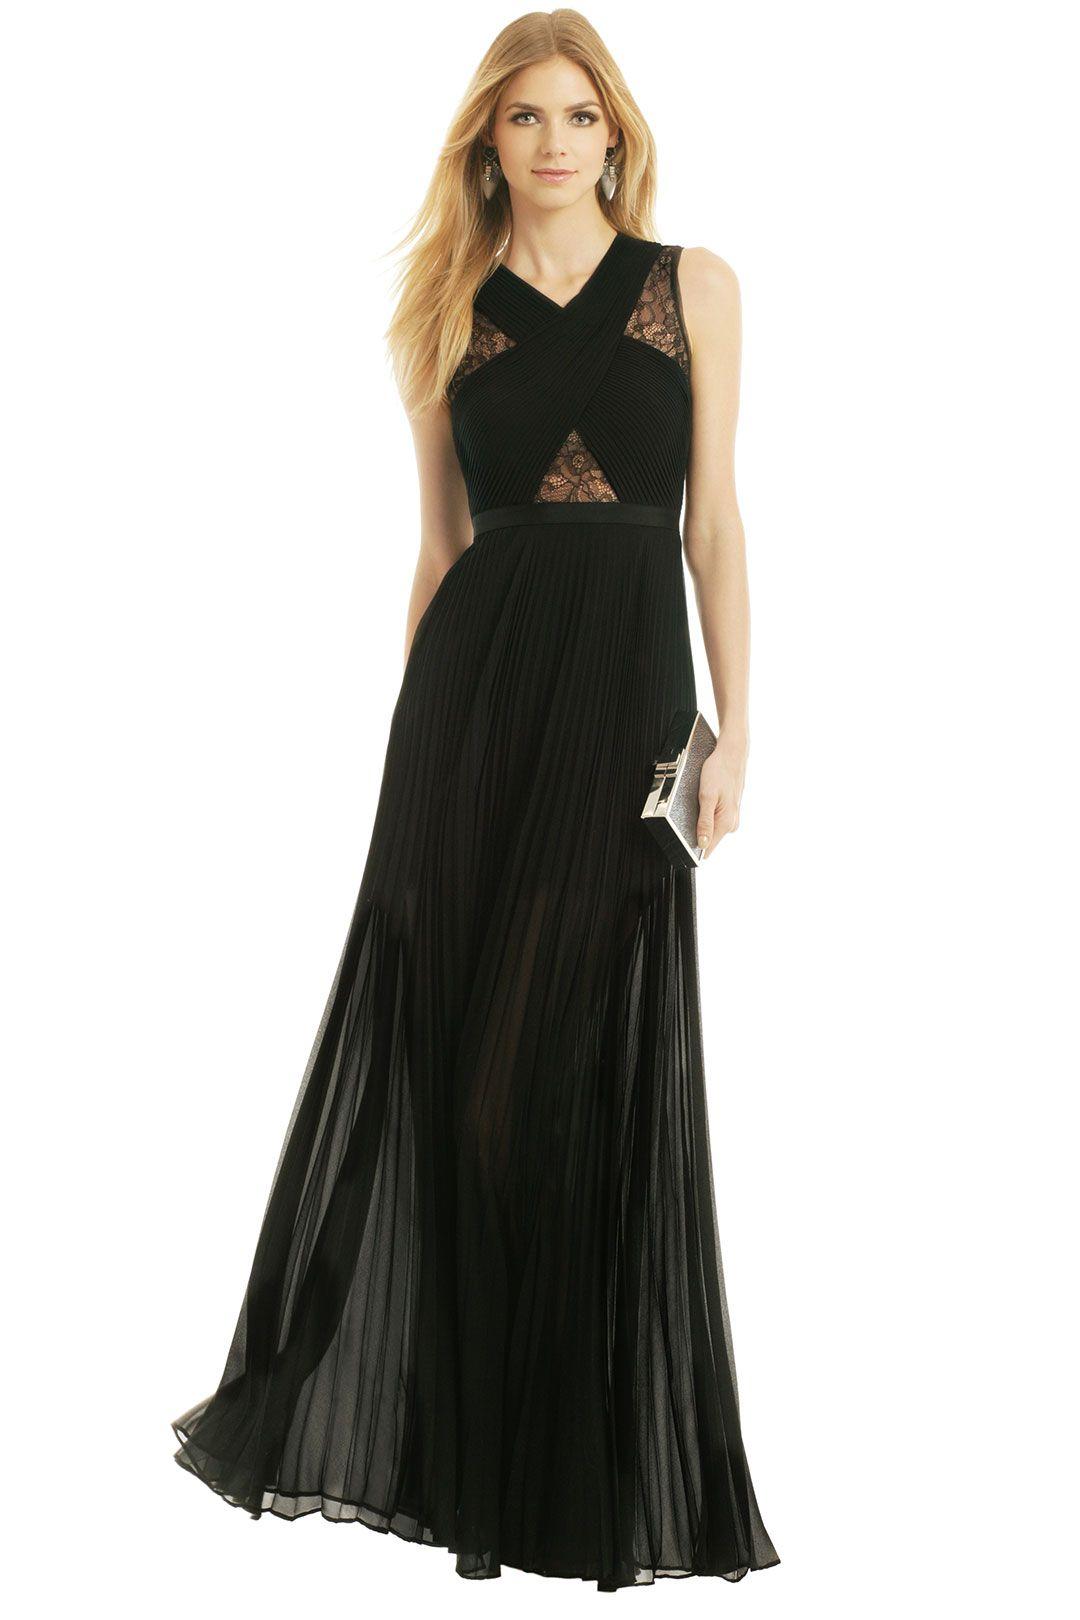 c222494644a9 BCBGMAXAZRIA Caia Pleated Gown. Bridesmaids dress for Kerrin's wedding!